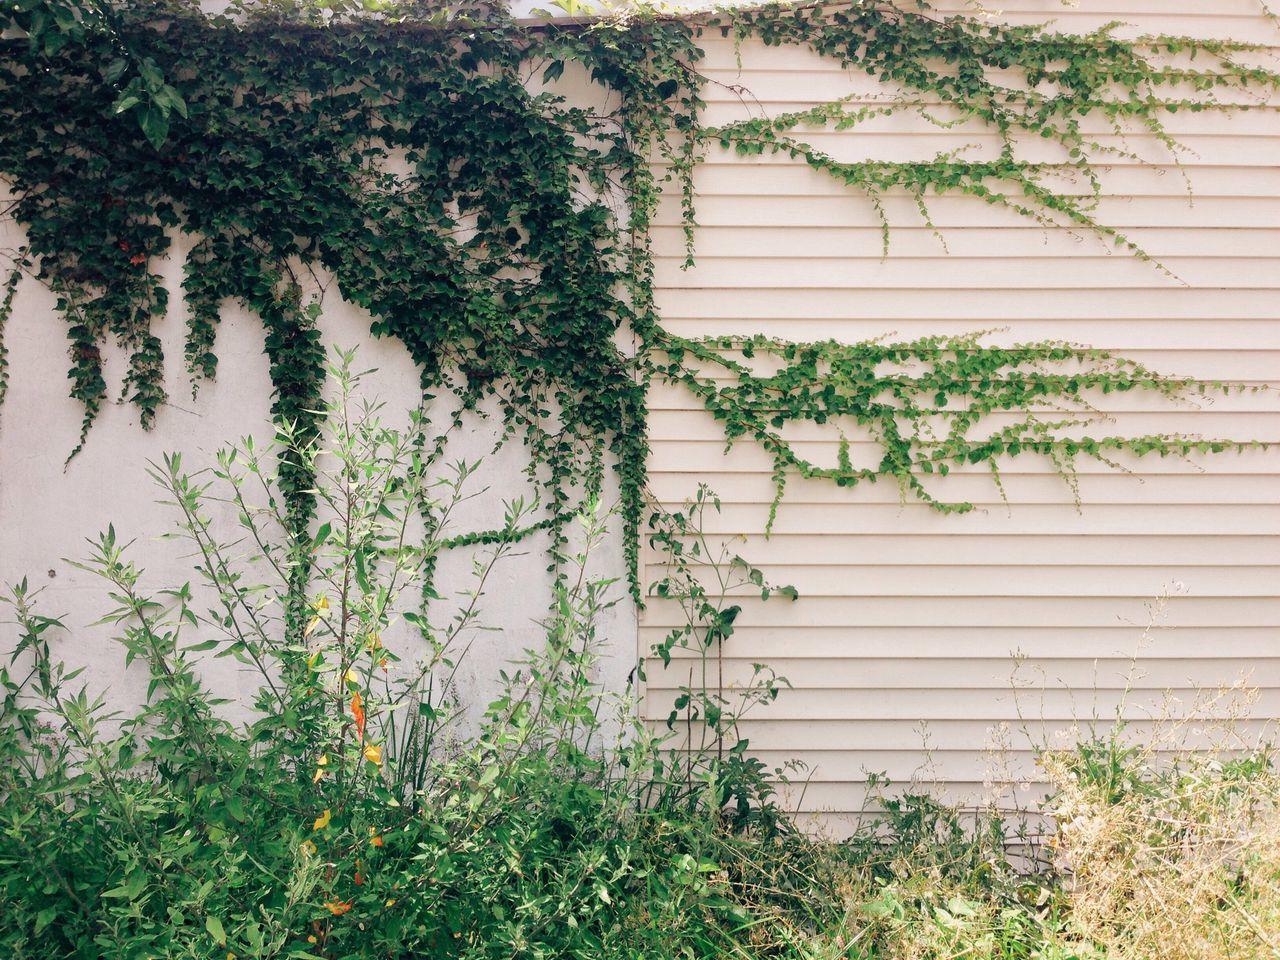 Urban Nature VSCO Smart Simplicity